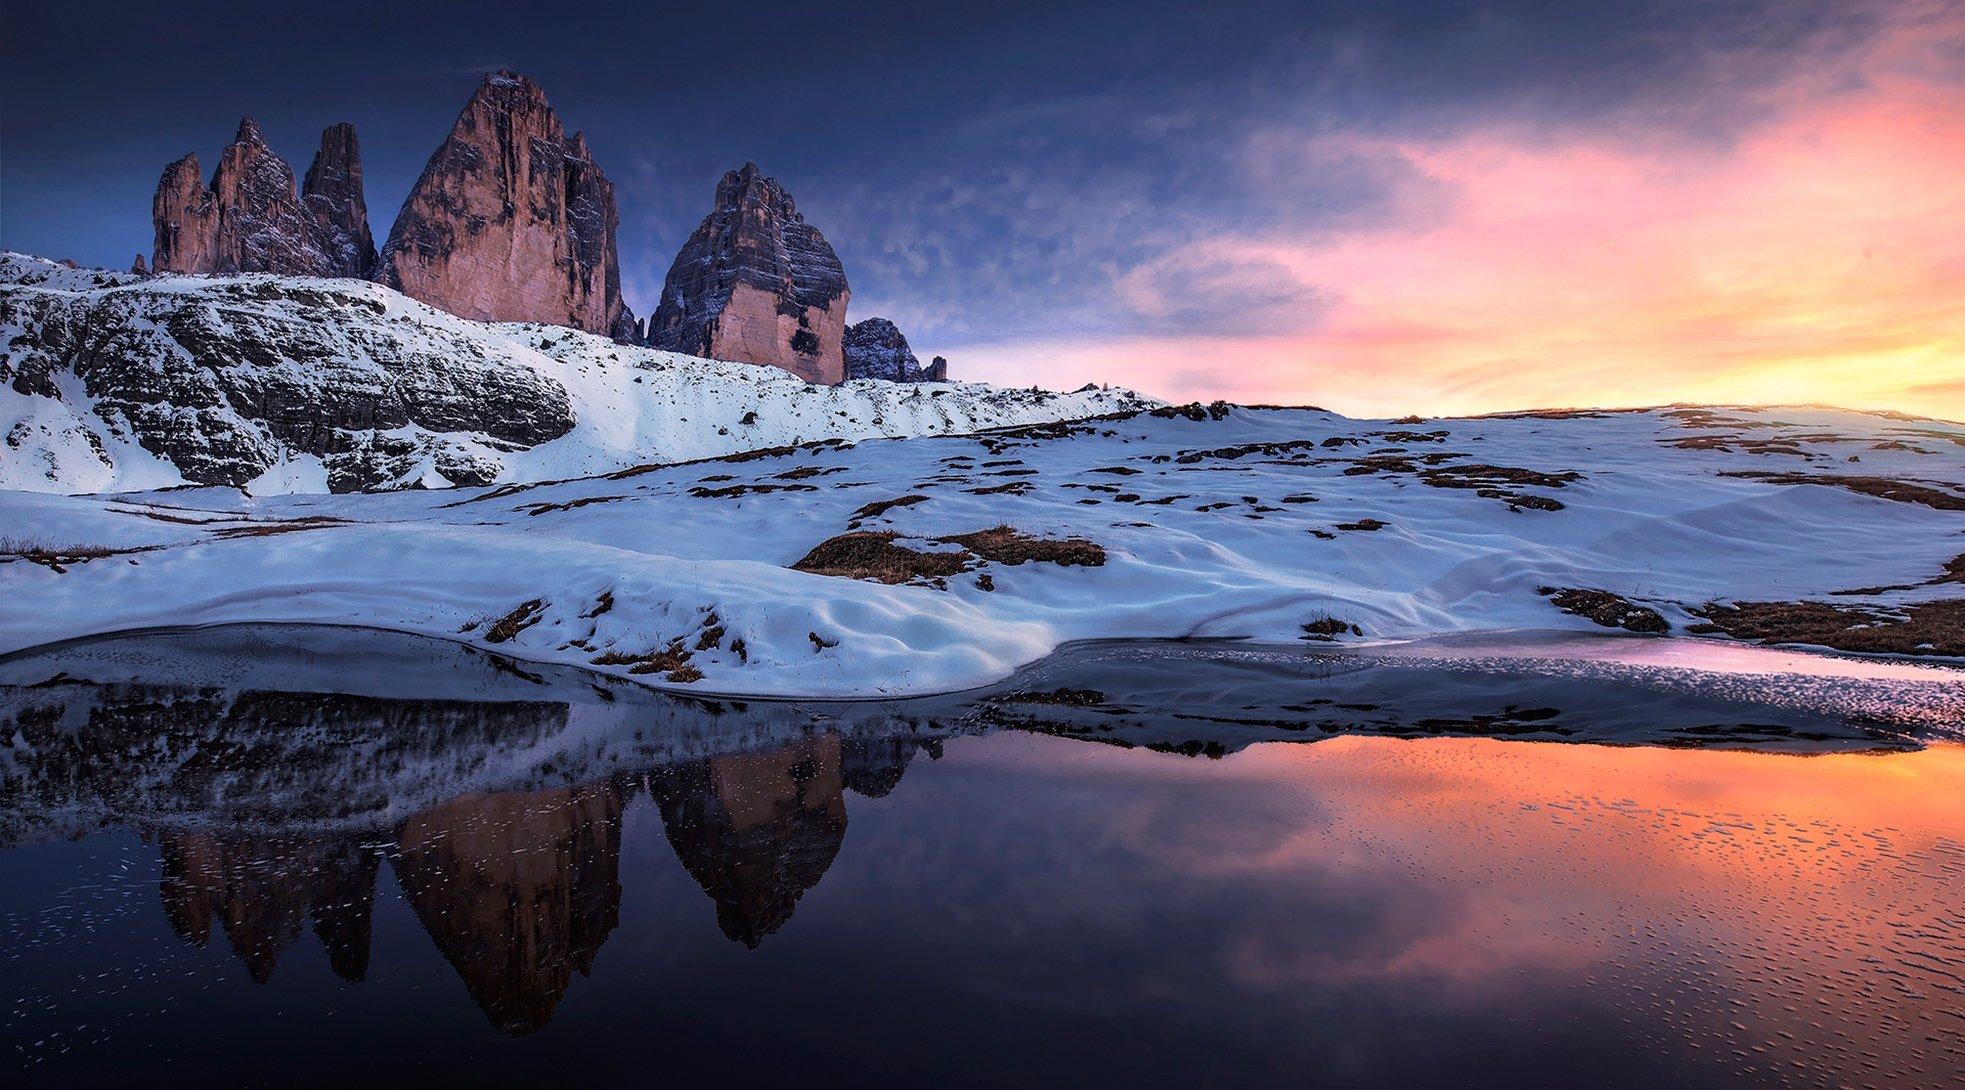 природа скалы горы снег nature rock mountains snow без смс